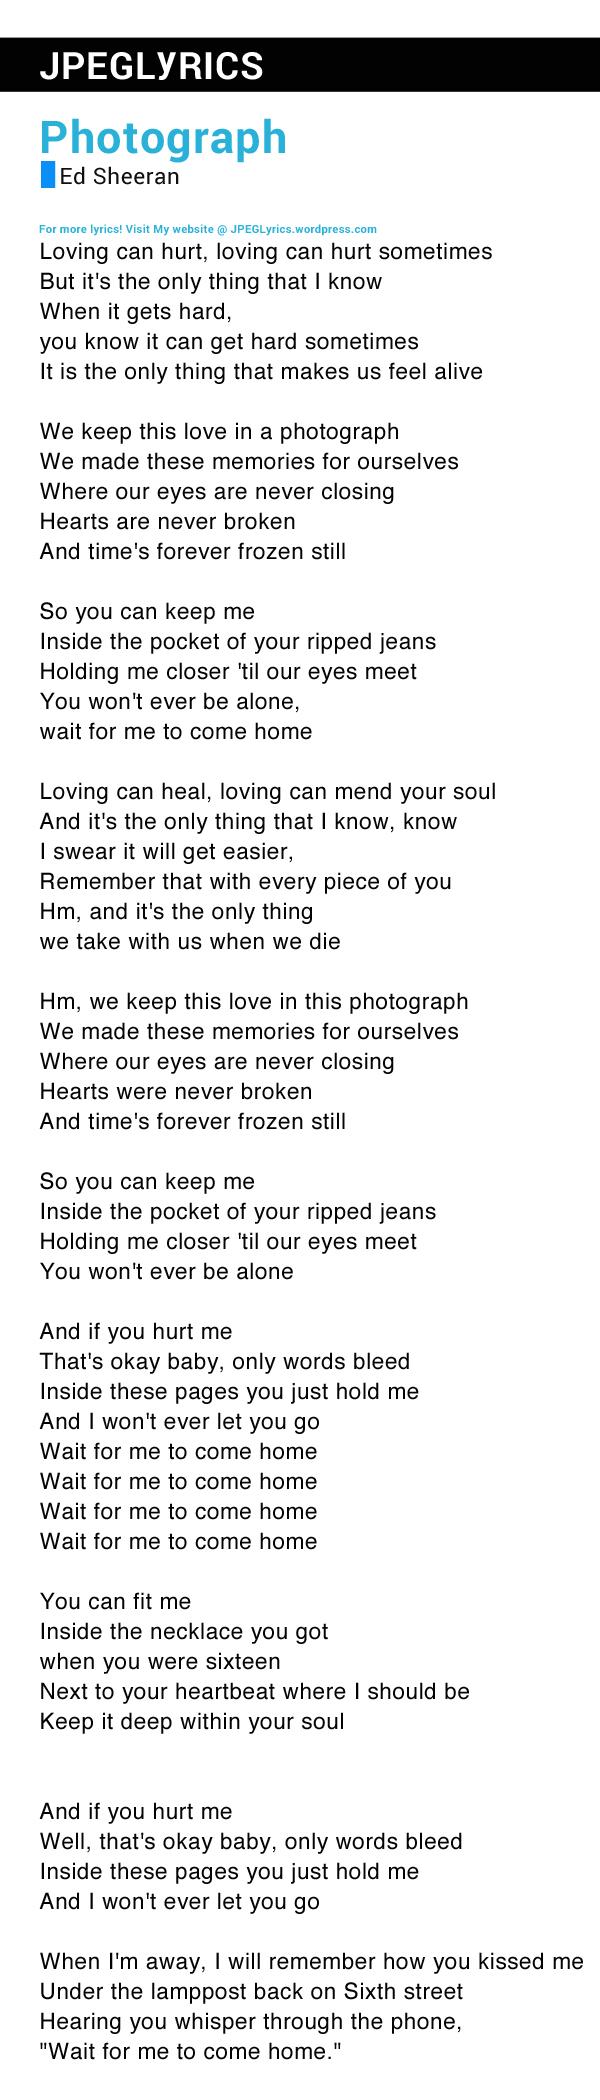 Ed Sheeran Photograph Meaning : sheeran, photograph, meaning, Photograph, Lyrics, Sheeran